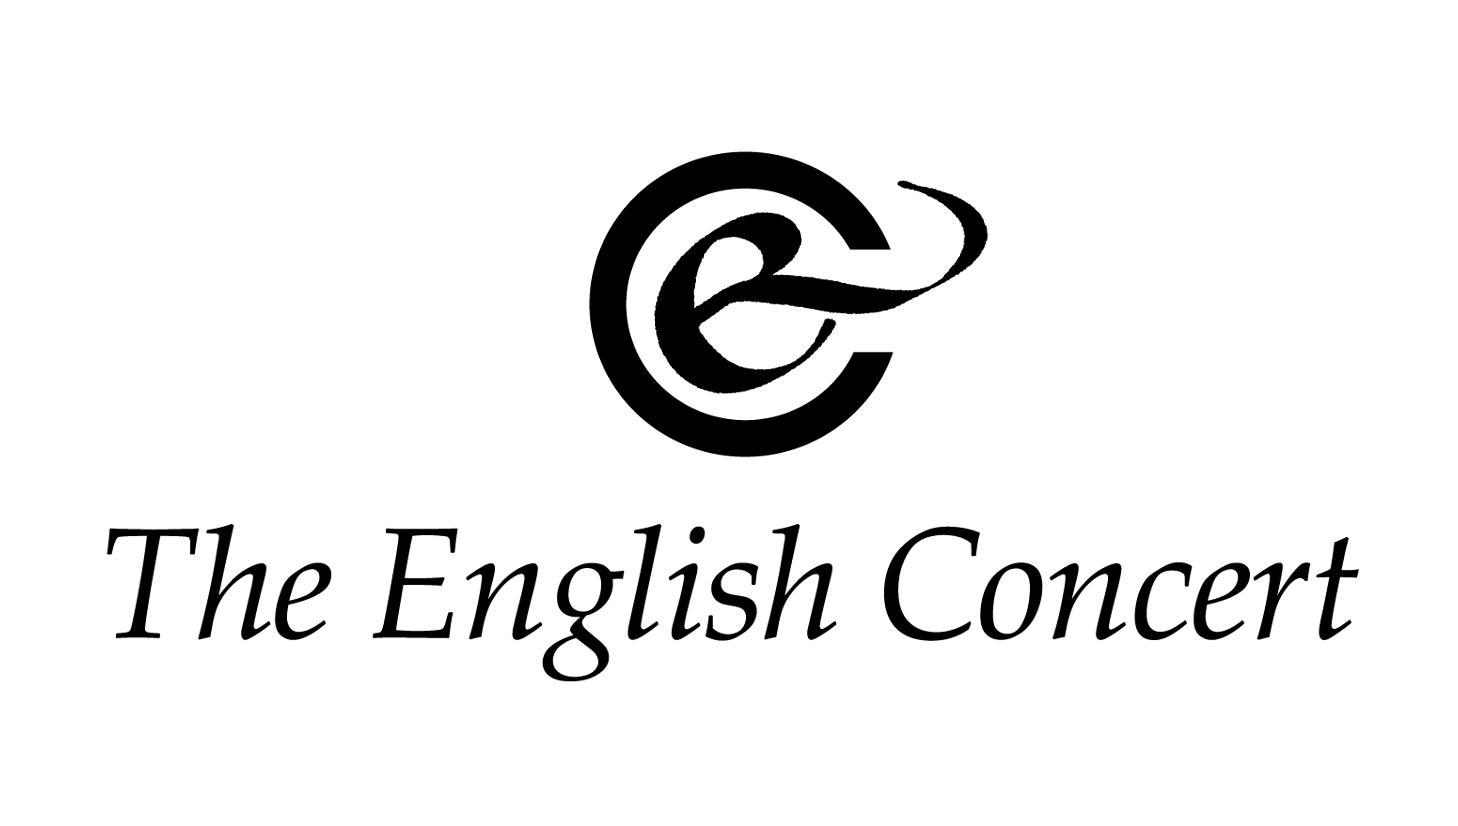 The English Concert logo